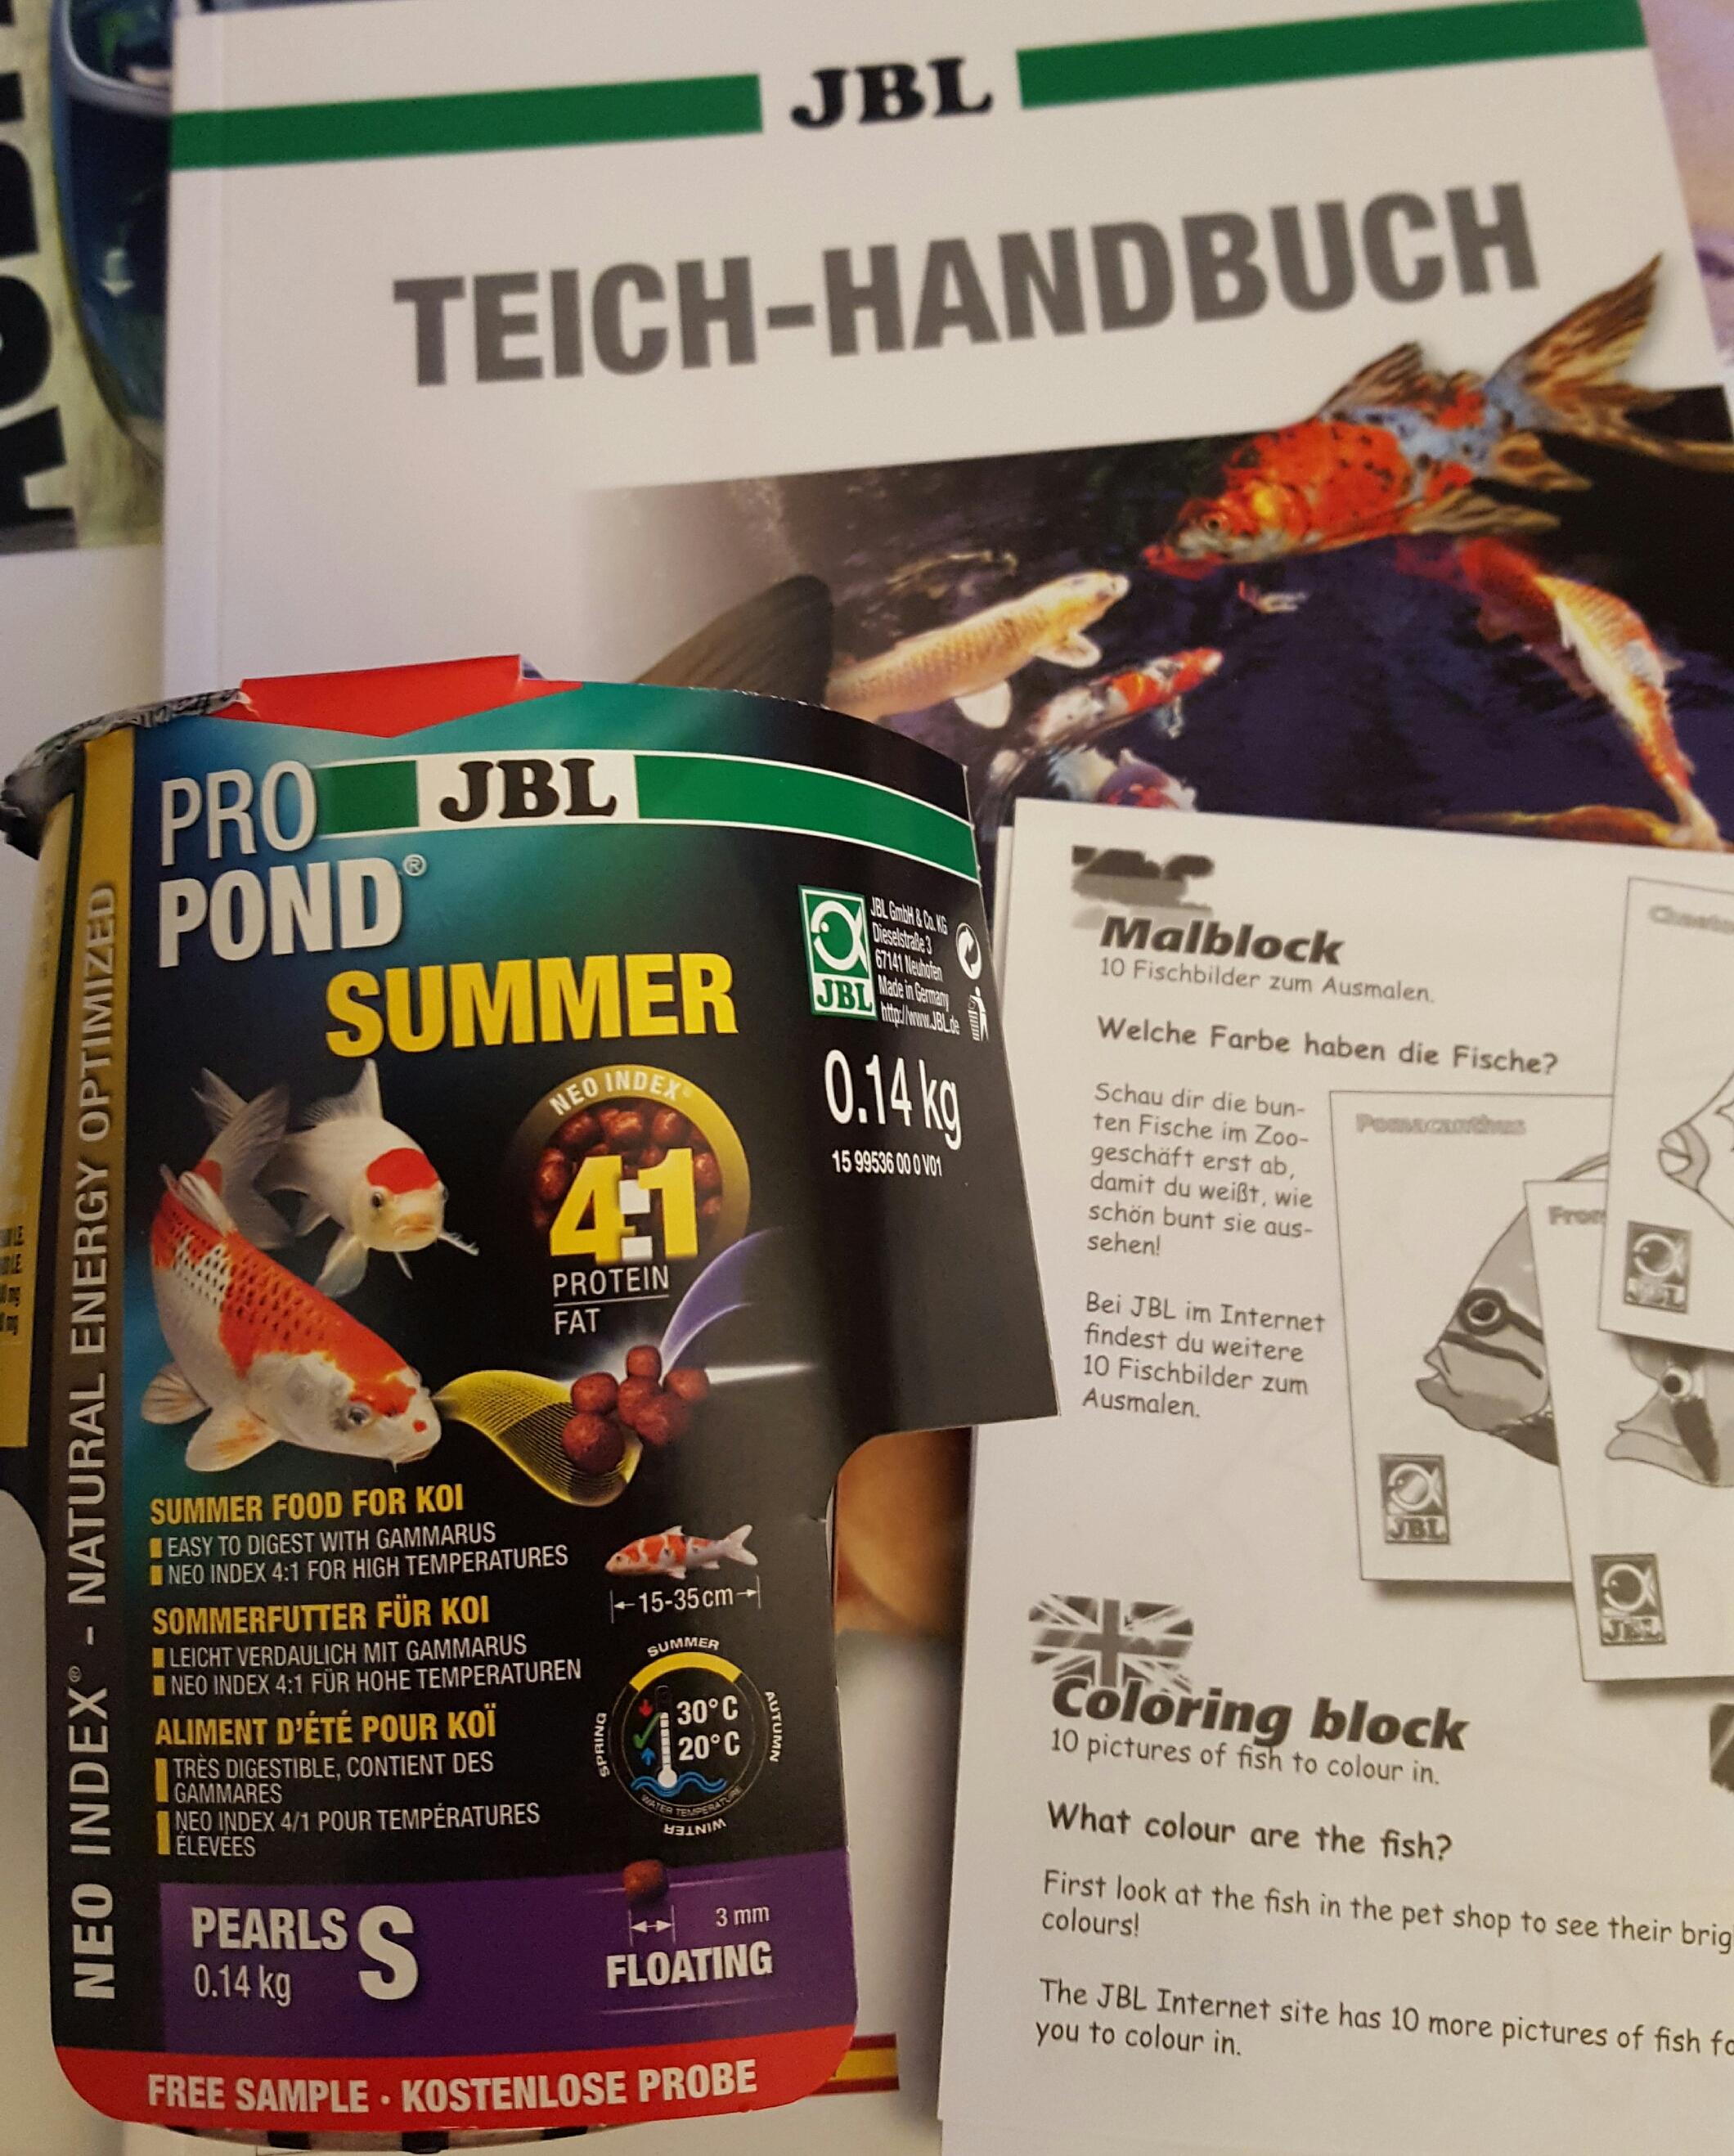 (Lokal 74821 Mosbach) JBL ProPond Koi Futterprobe, Kindermalblock, Teichhandbuch kostenlos